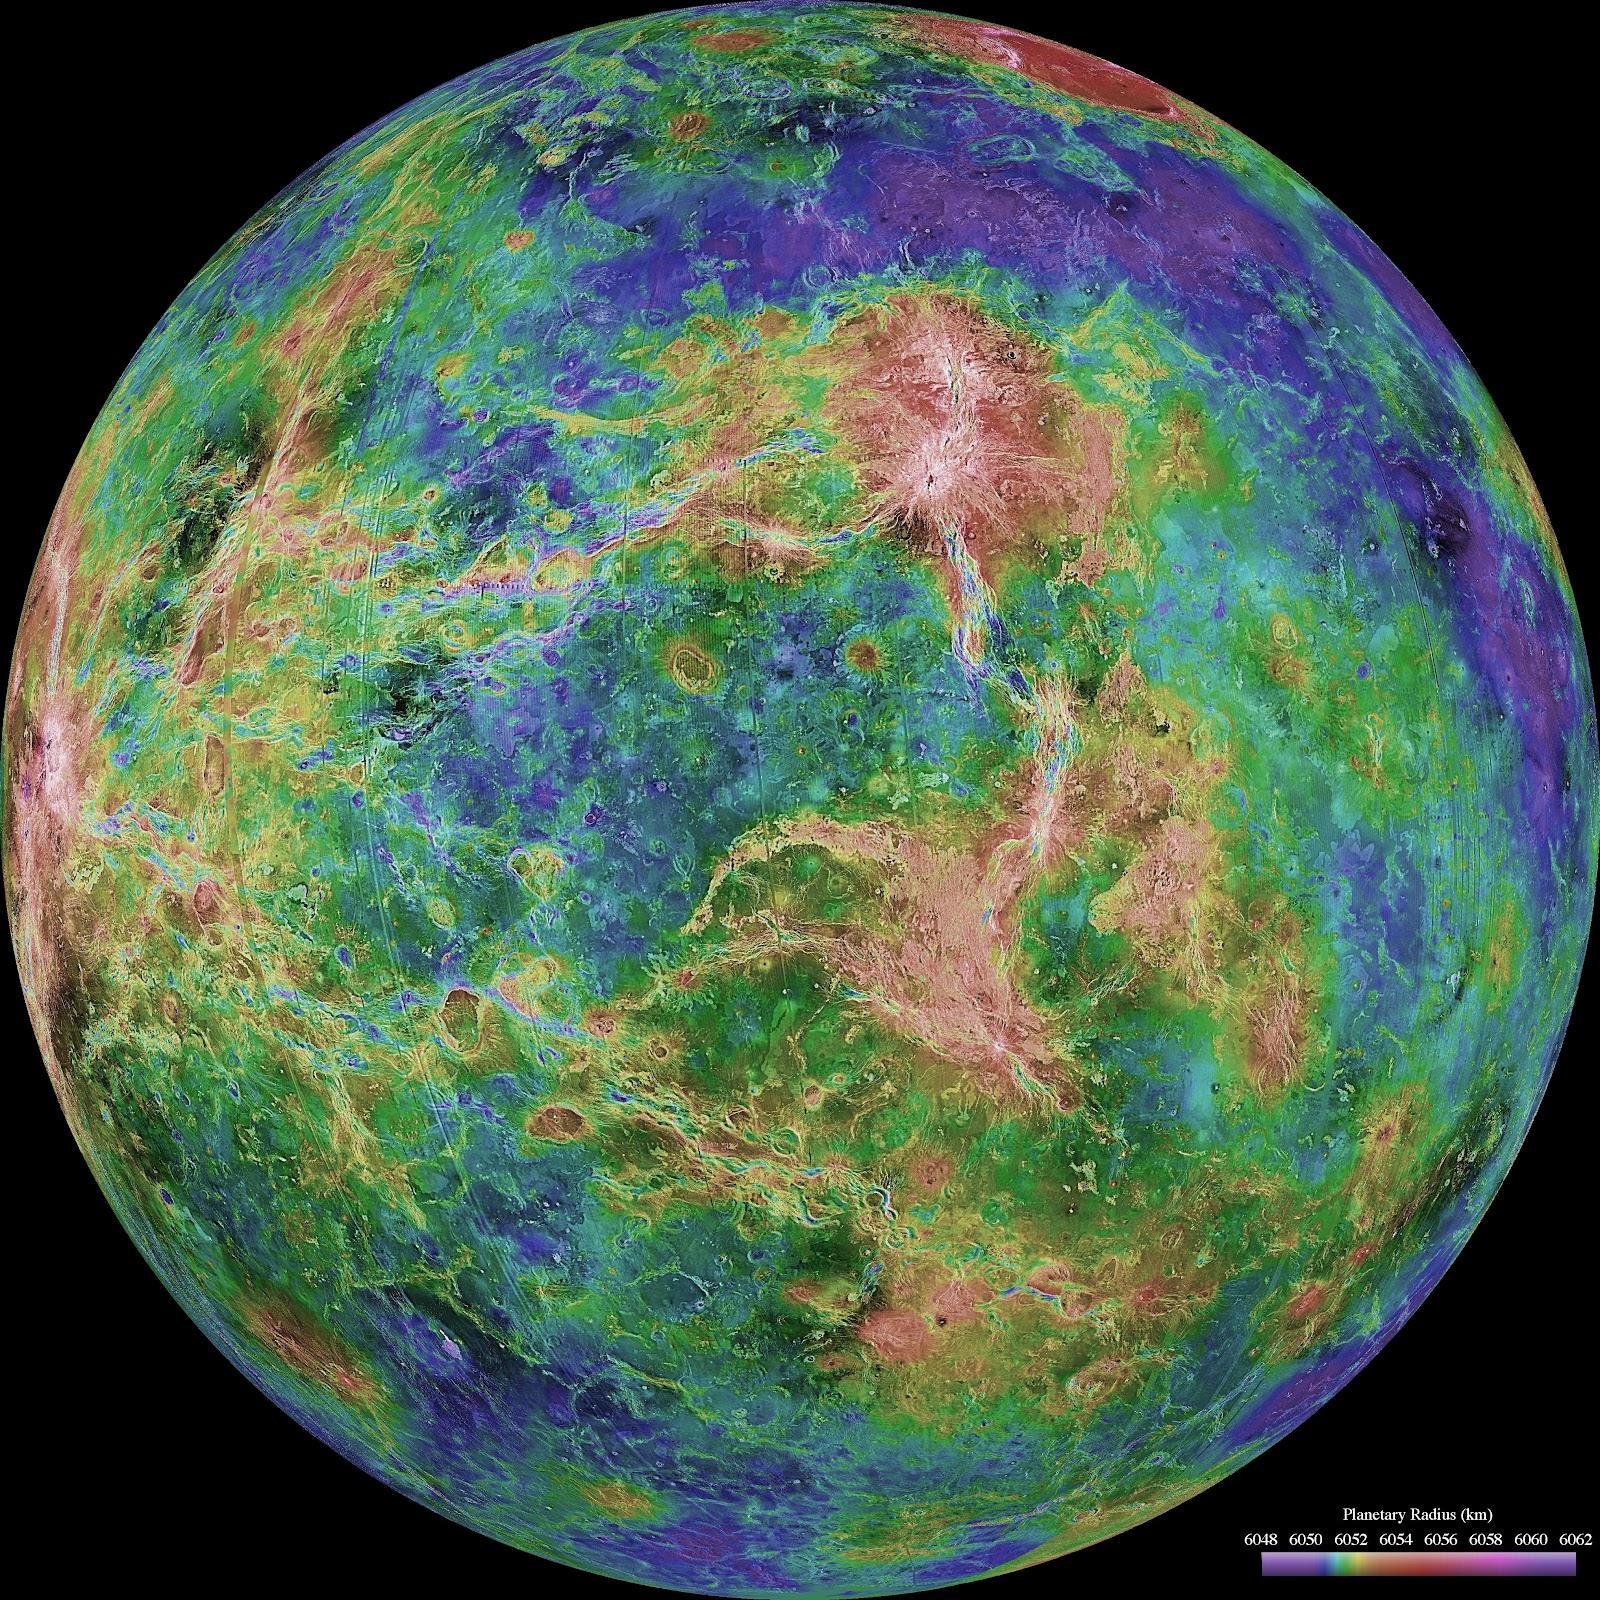 space exploration of venus - photo #5